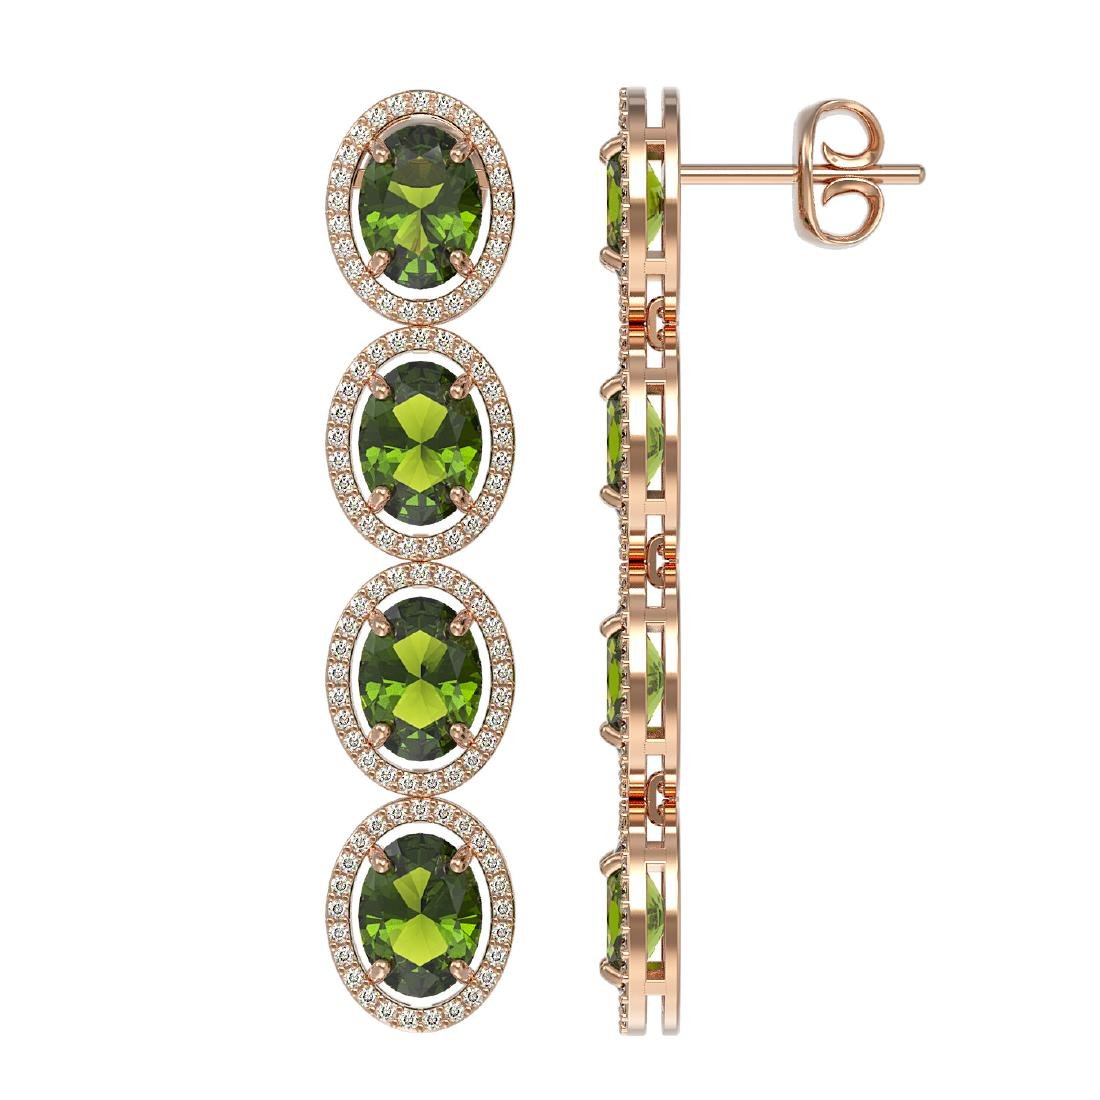 11.8 CTW Tourmaline & Diamond Halo Earrings 10K Rose - 2